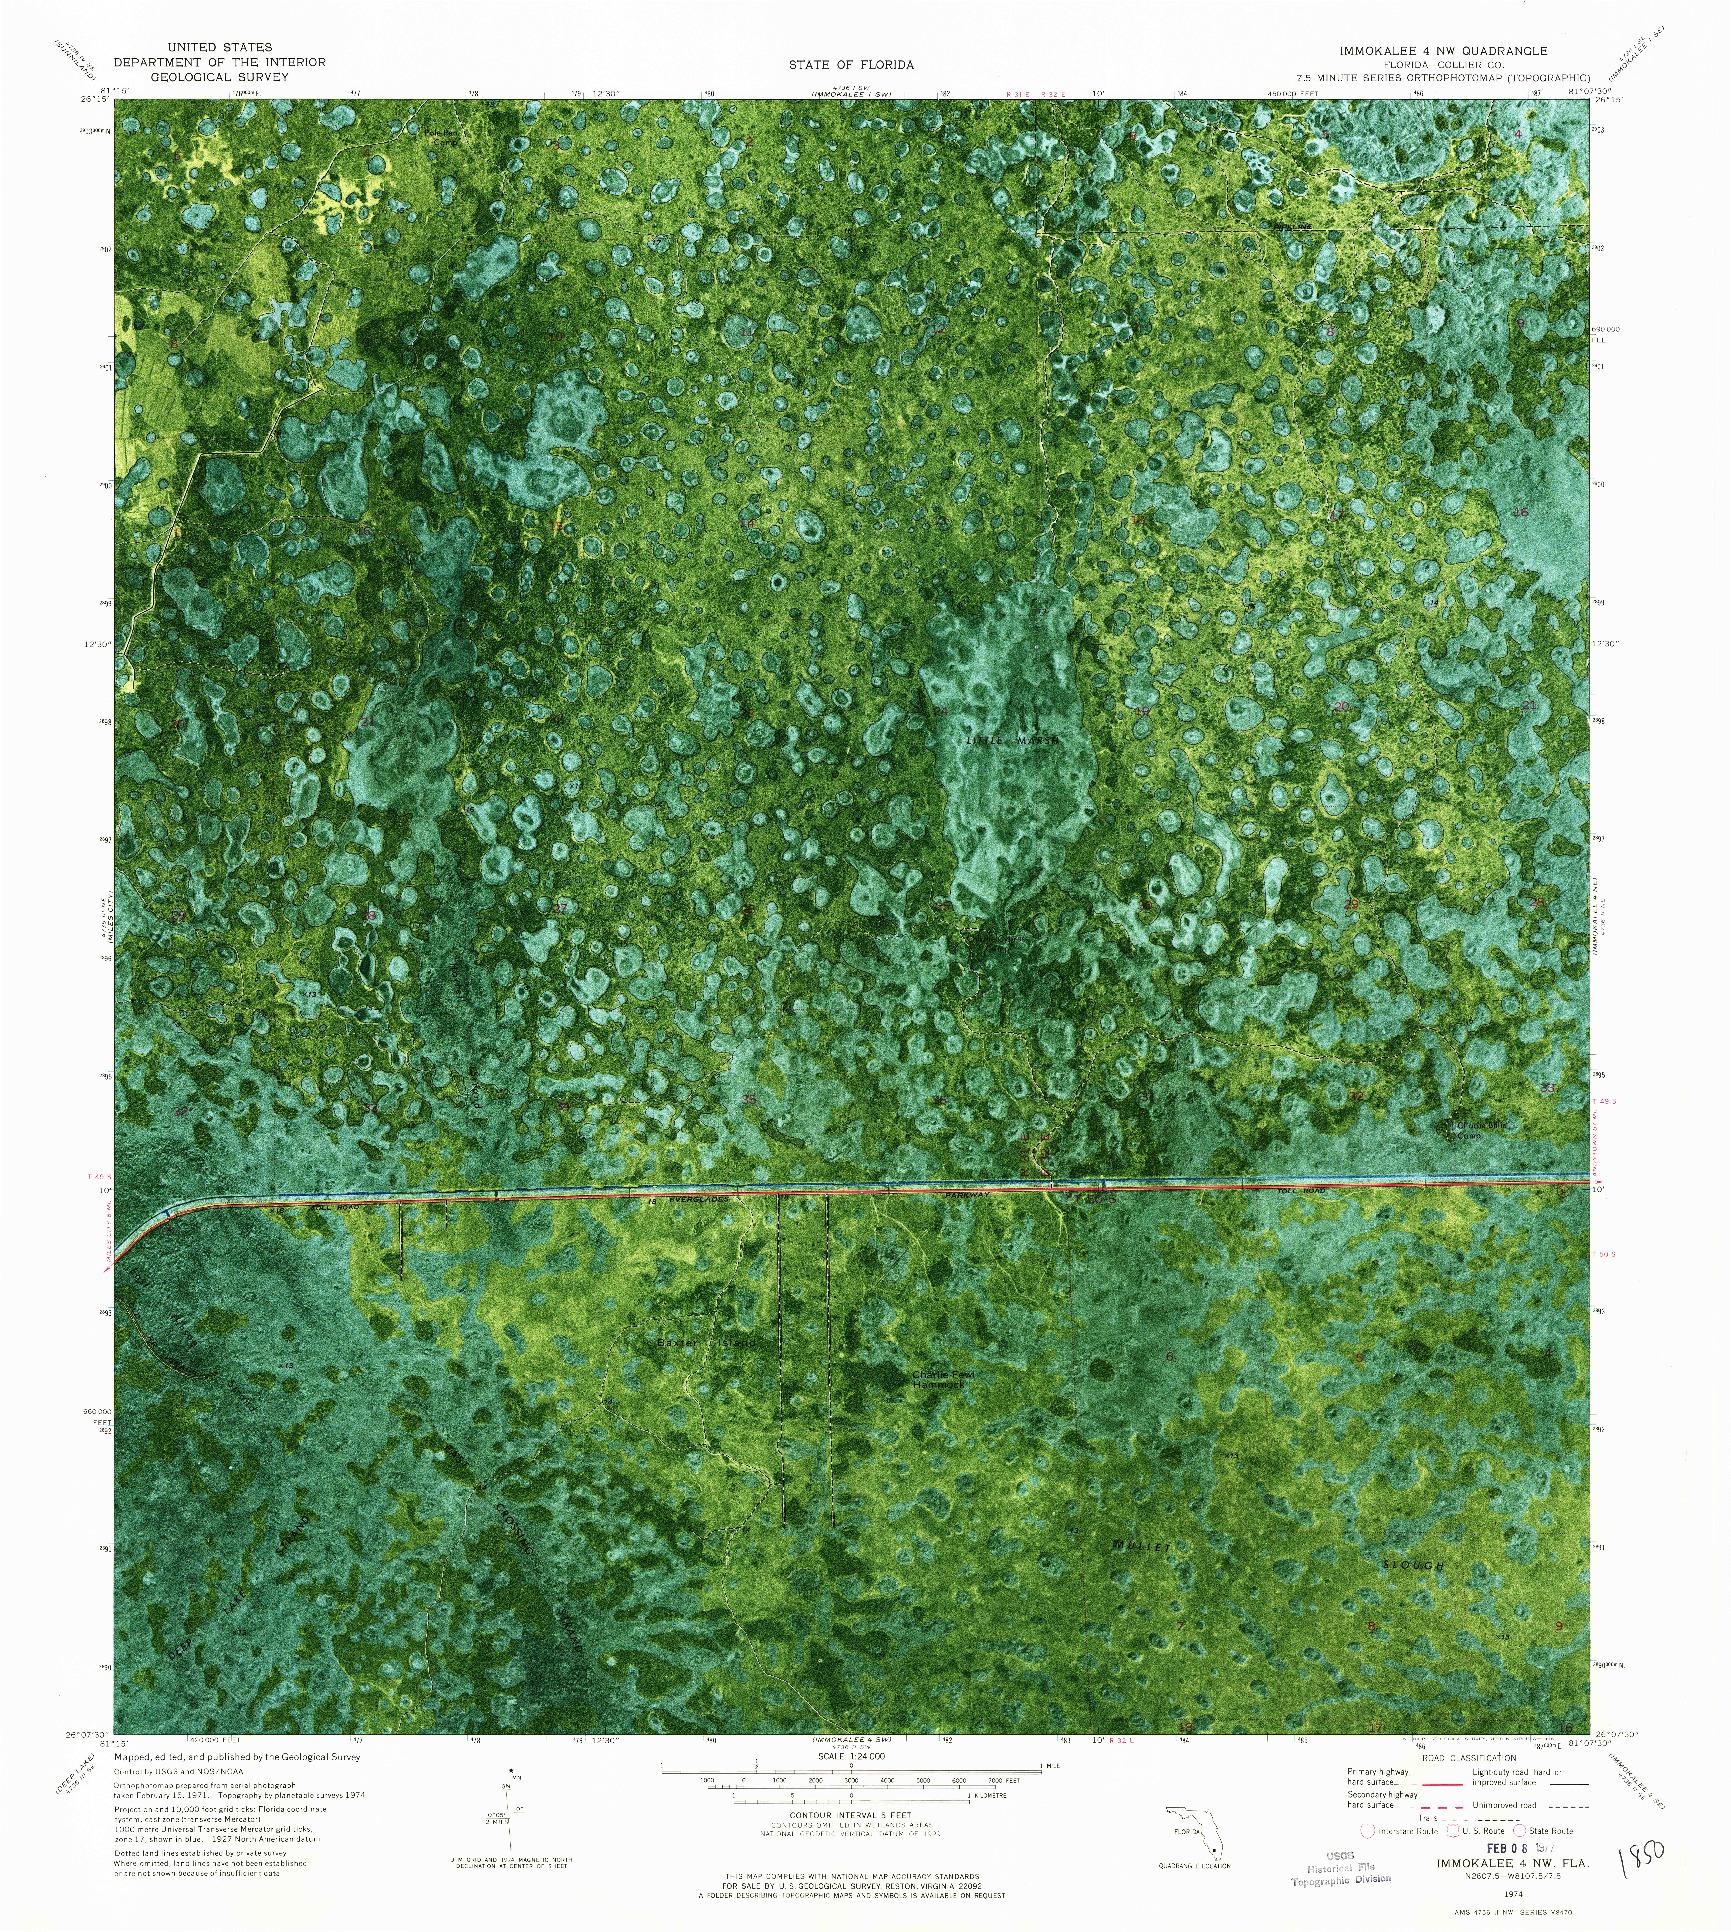 USGS 1:24000-SCALE QUADRANGLE FOR IMMOKALEE 4 NW, FL 1974